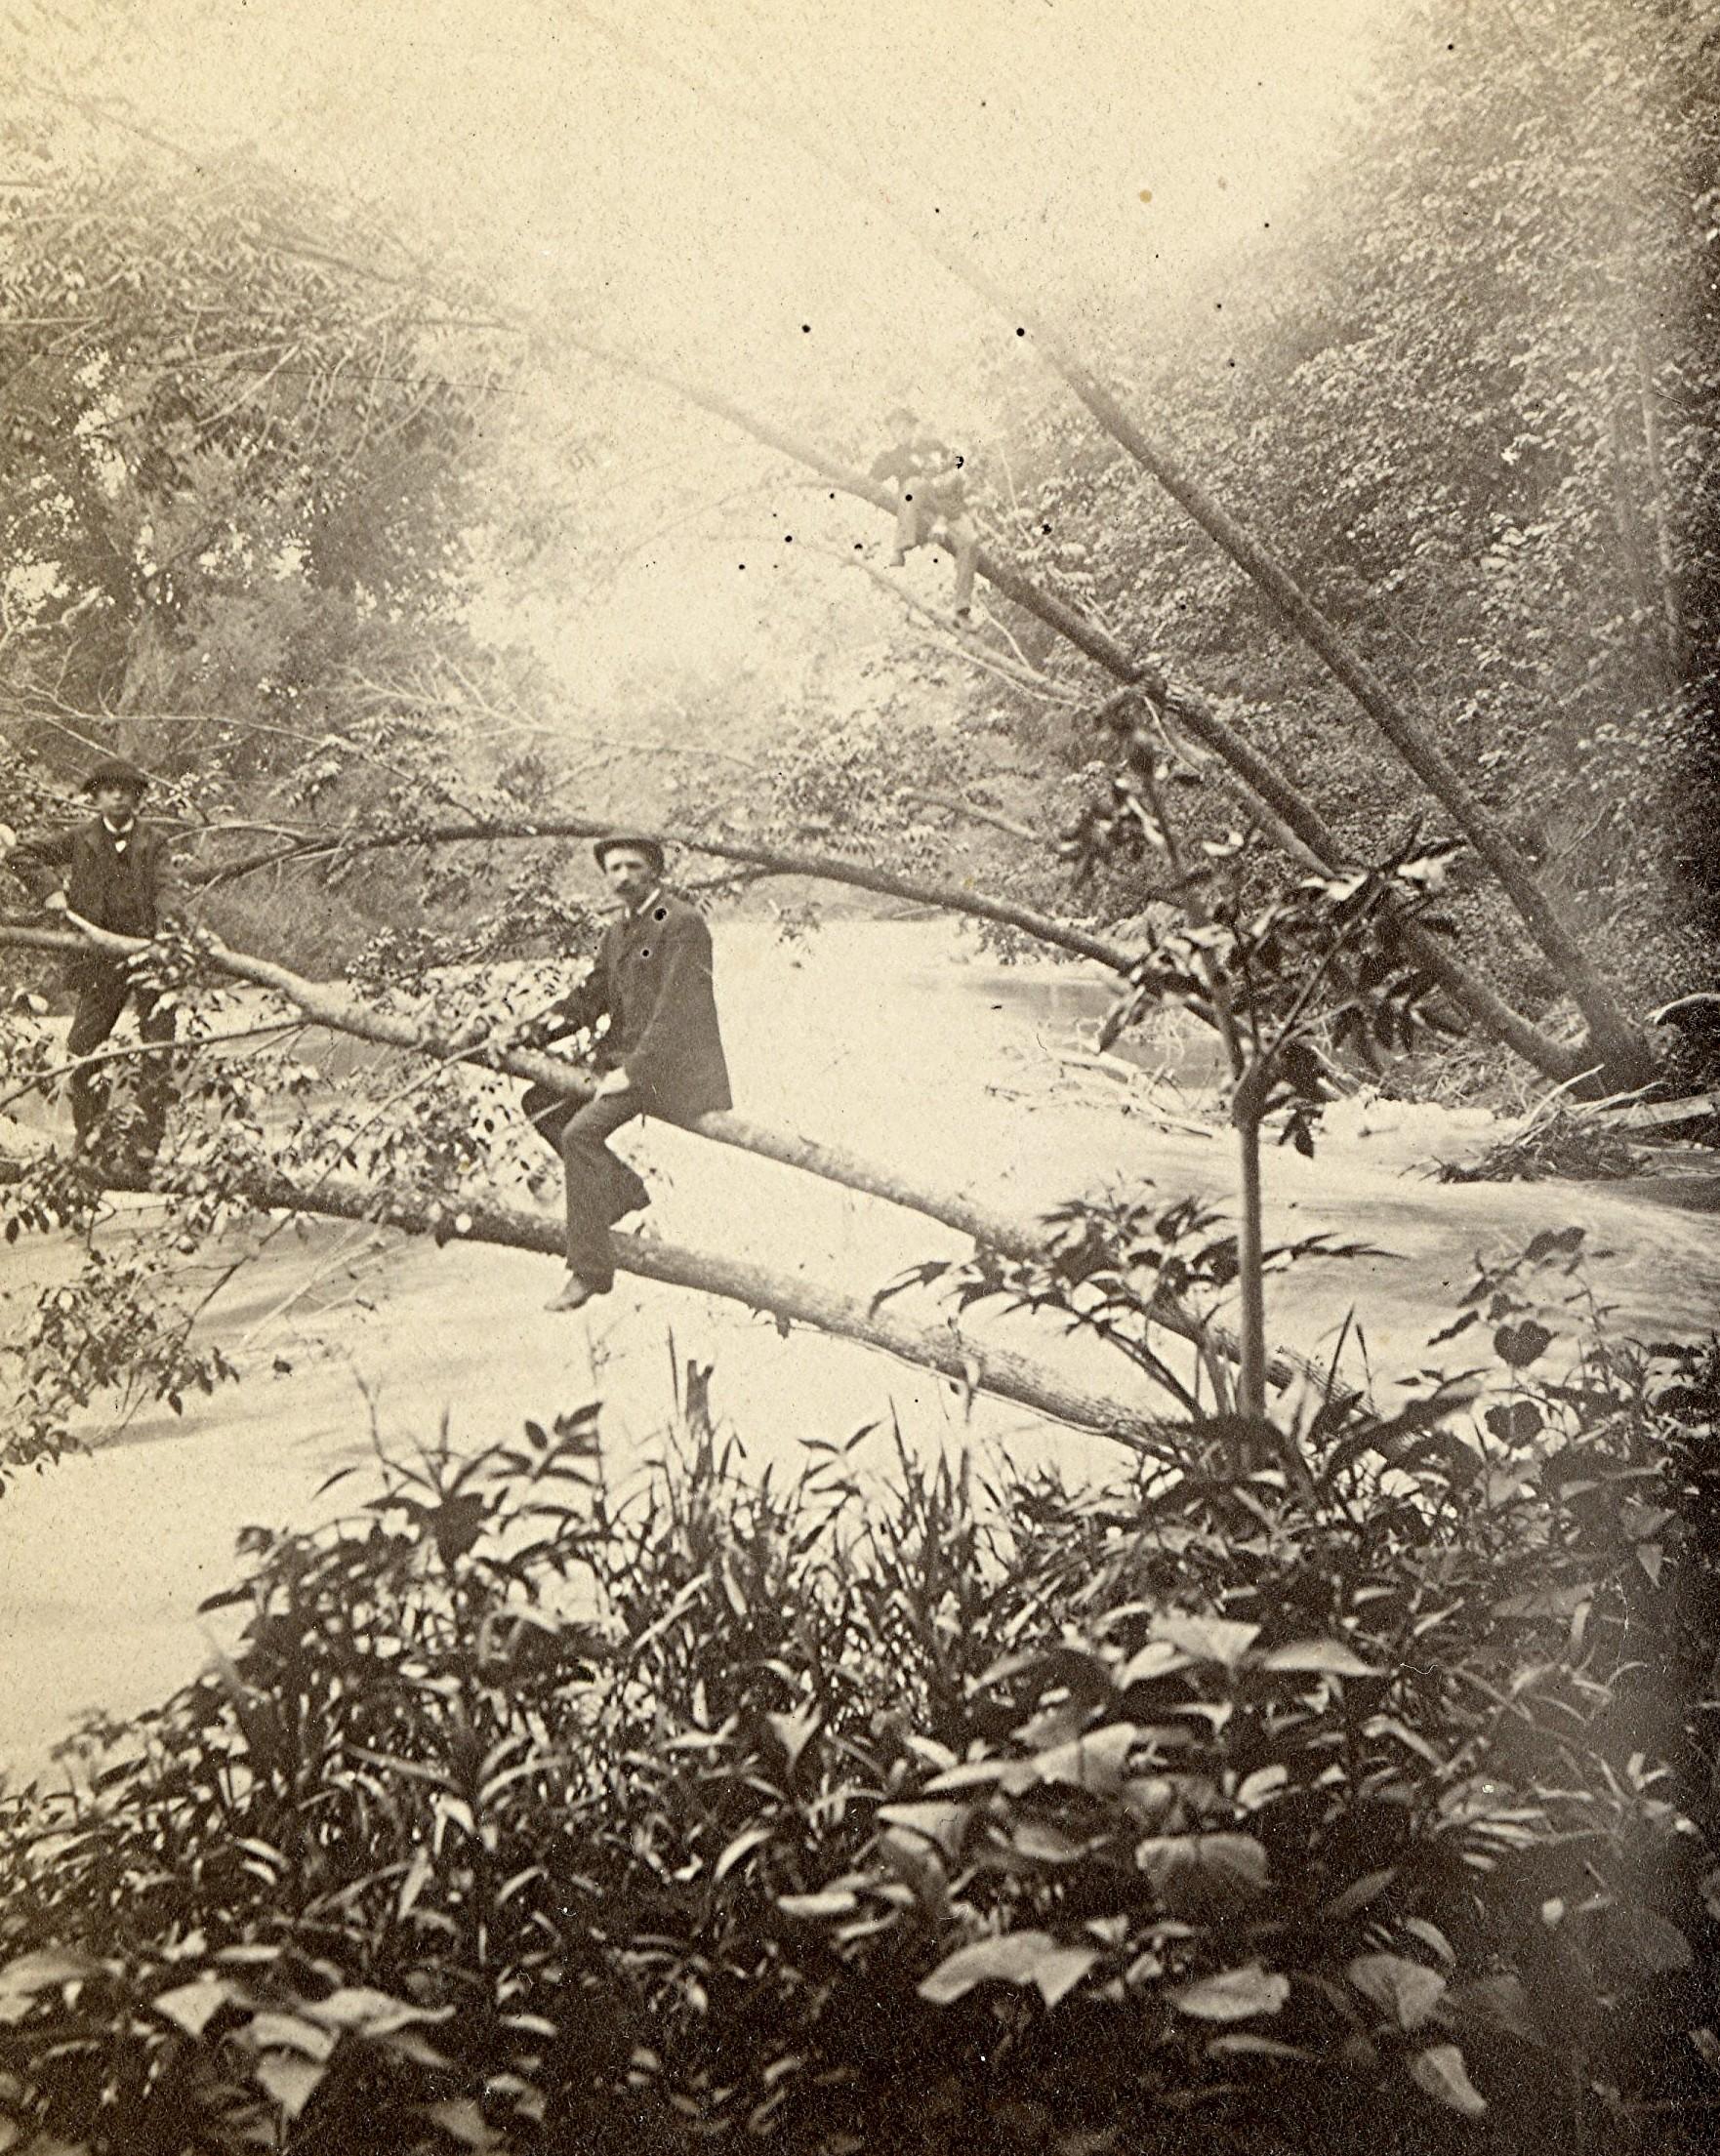 Menomonee Valley, c. early 1880s. Photo courtesy of Jeff Beutner.